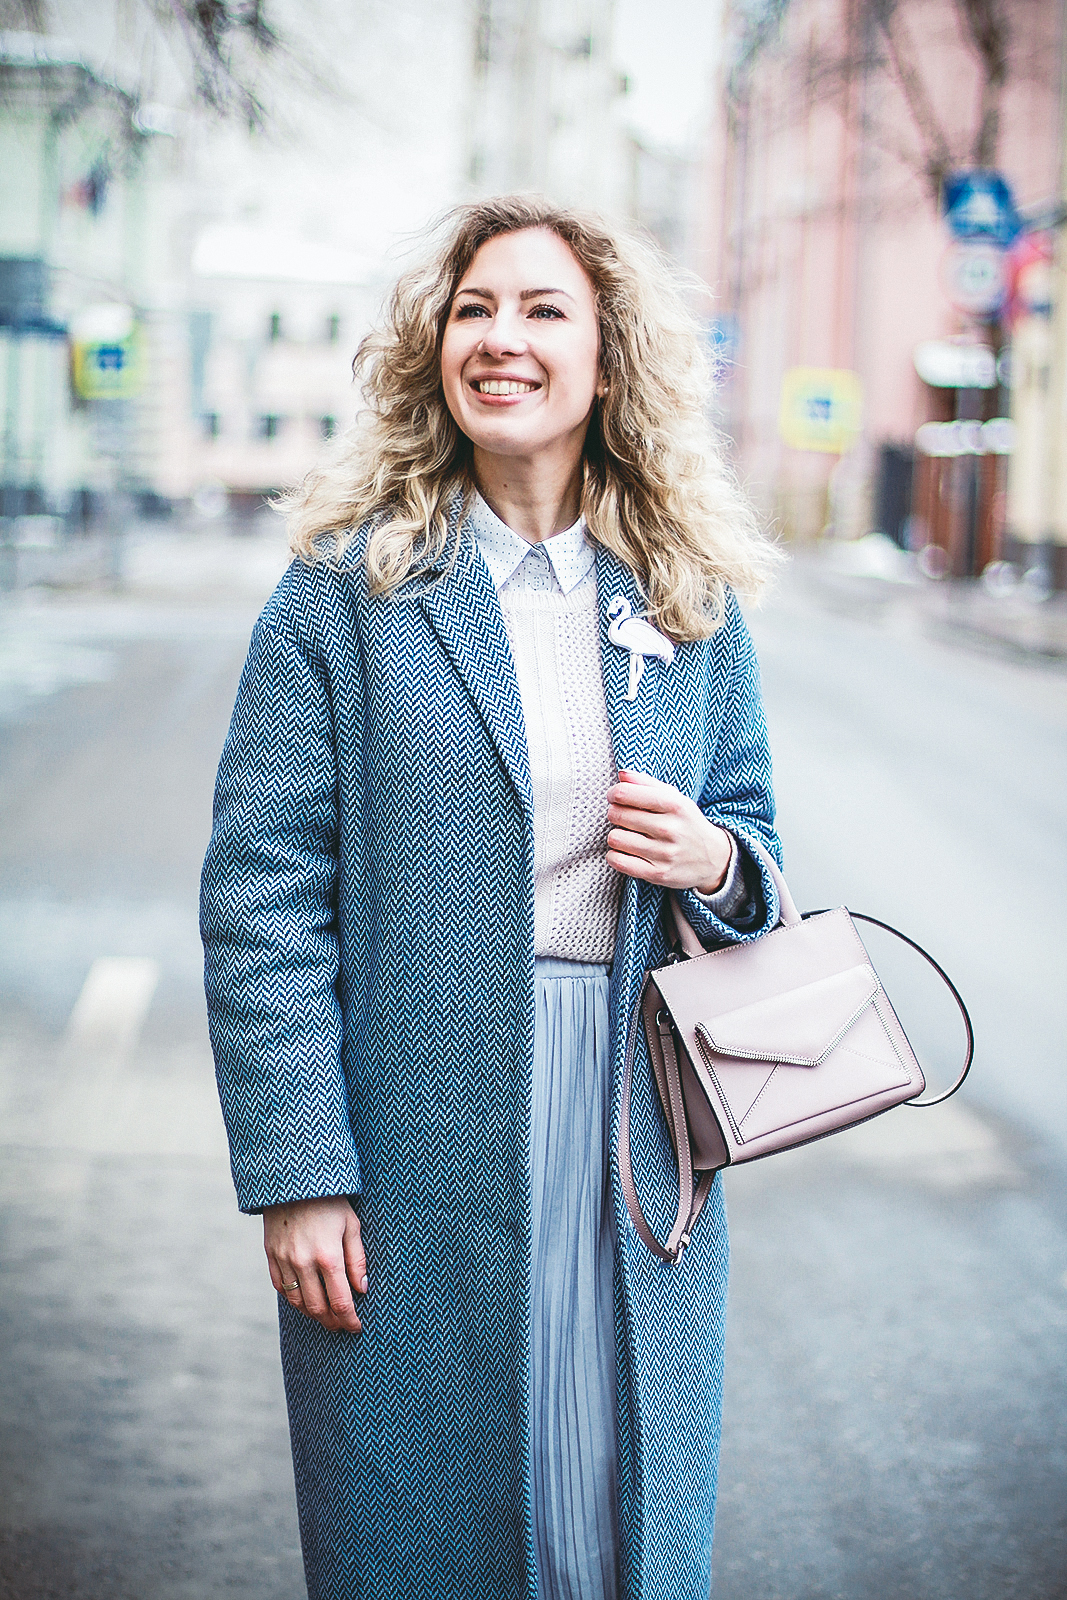 Margarita_Maslova_Ritalifestyle_Fashion_blogger_Moscow_Romantic_style_sport_chic_niagara_color_spring2017_valentins_day_look